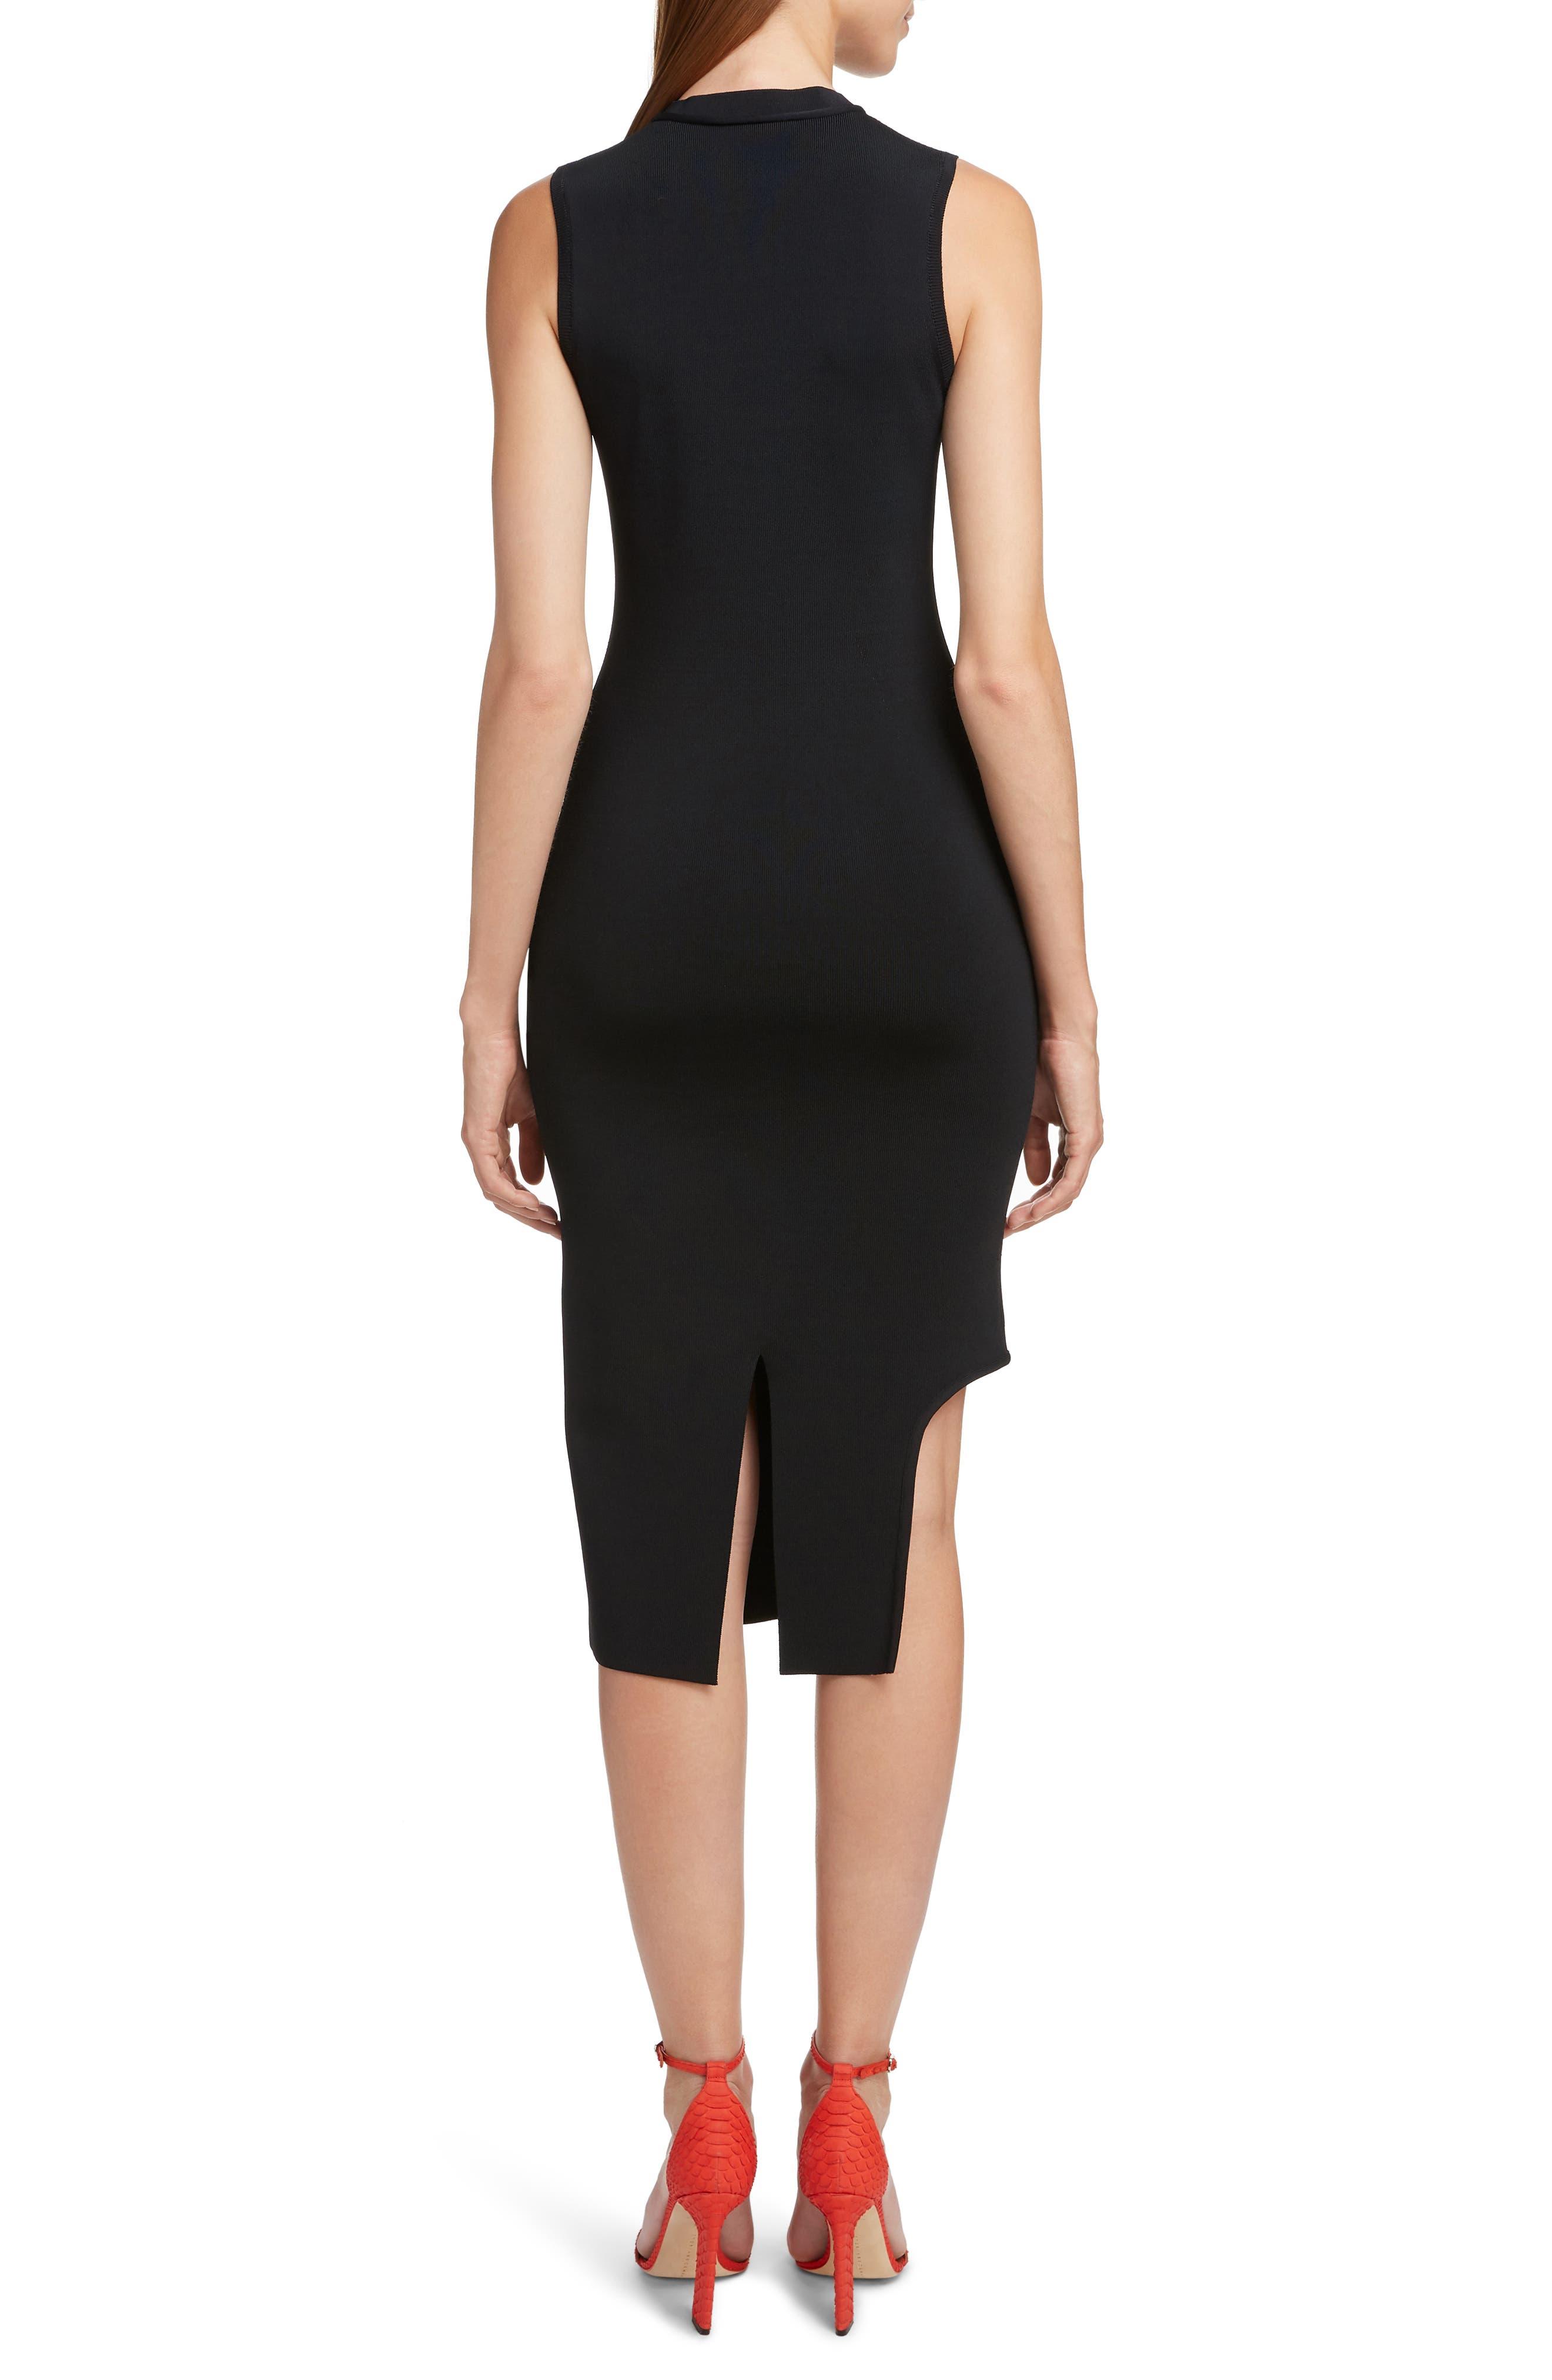 VICTORIA BECKHAM, Cutout Knit Dress, Alternate thumbnail 2, color, BLACK